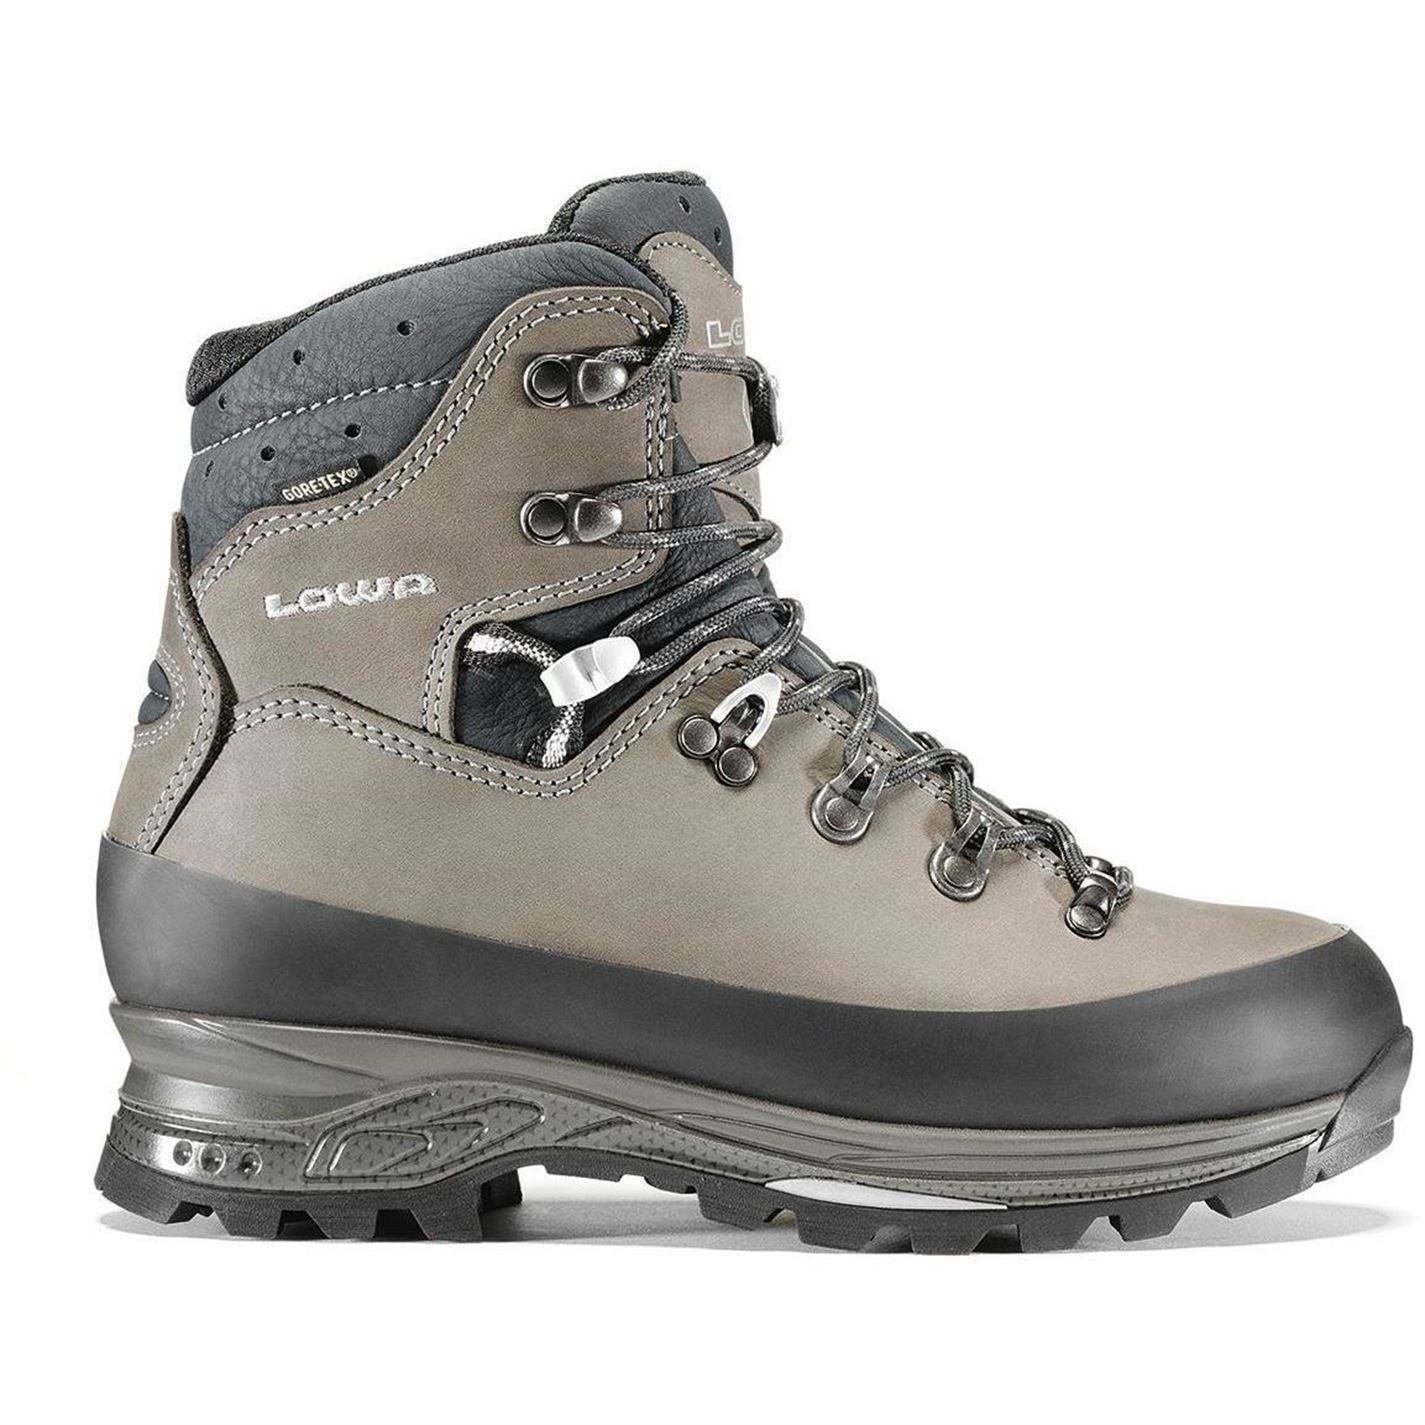 Awesome Lowa Palma Hiking Shoes (For Women) - Save 57%